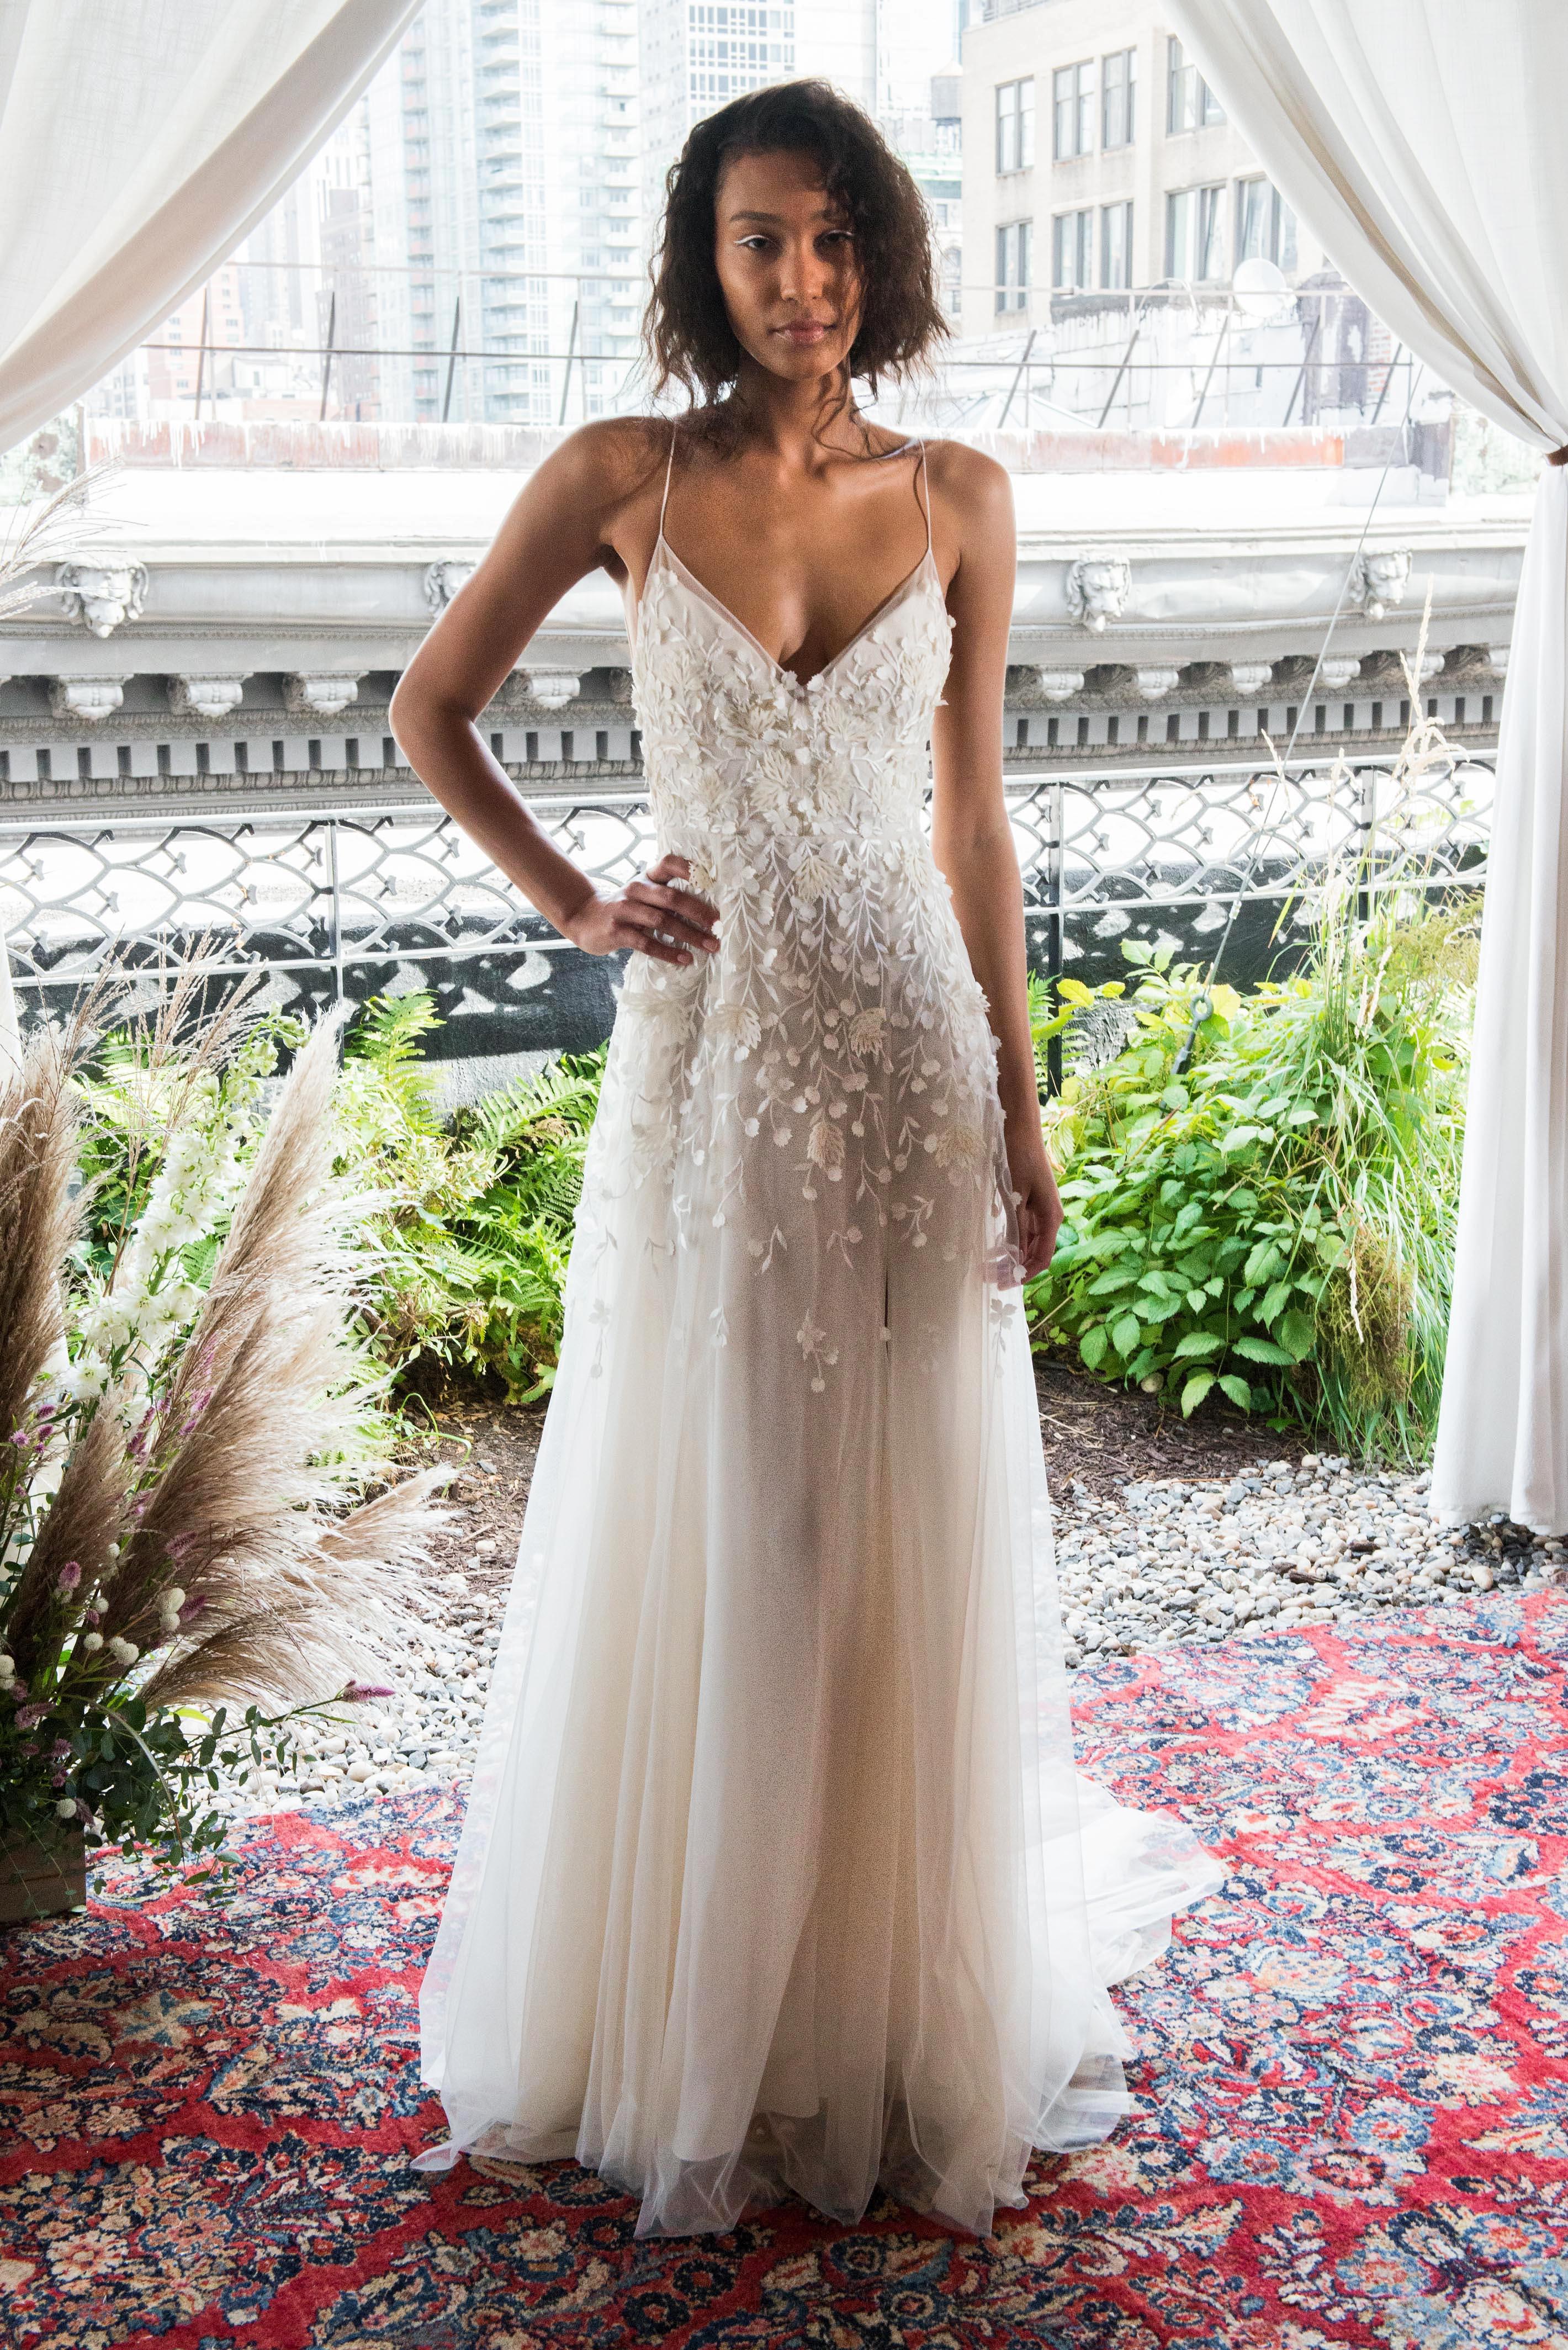 alexandra grecco wedding dress fall 2018 v-neck embellished spaghetti strap tulle